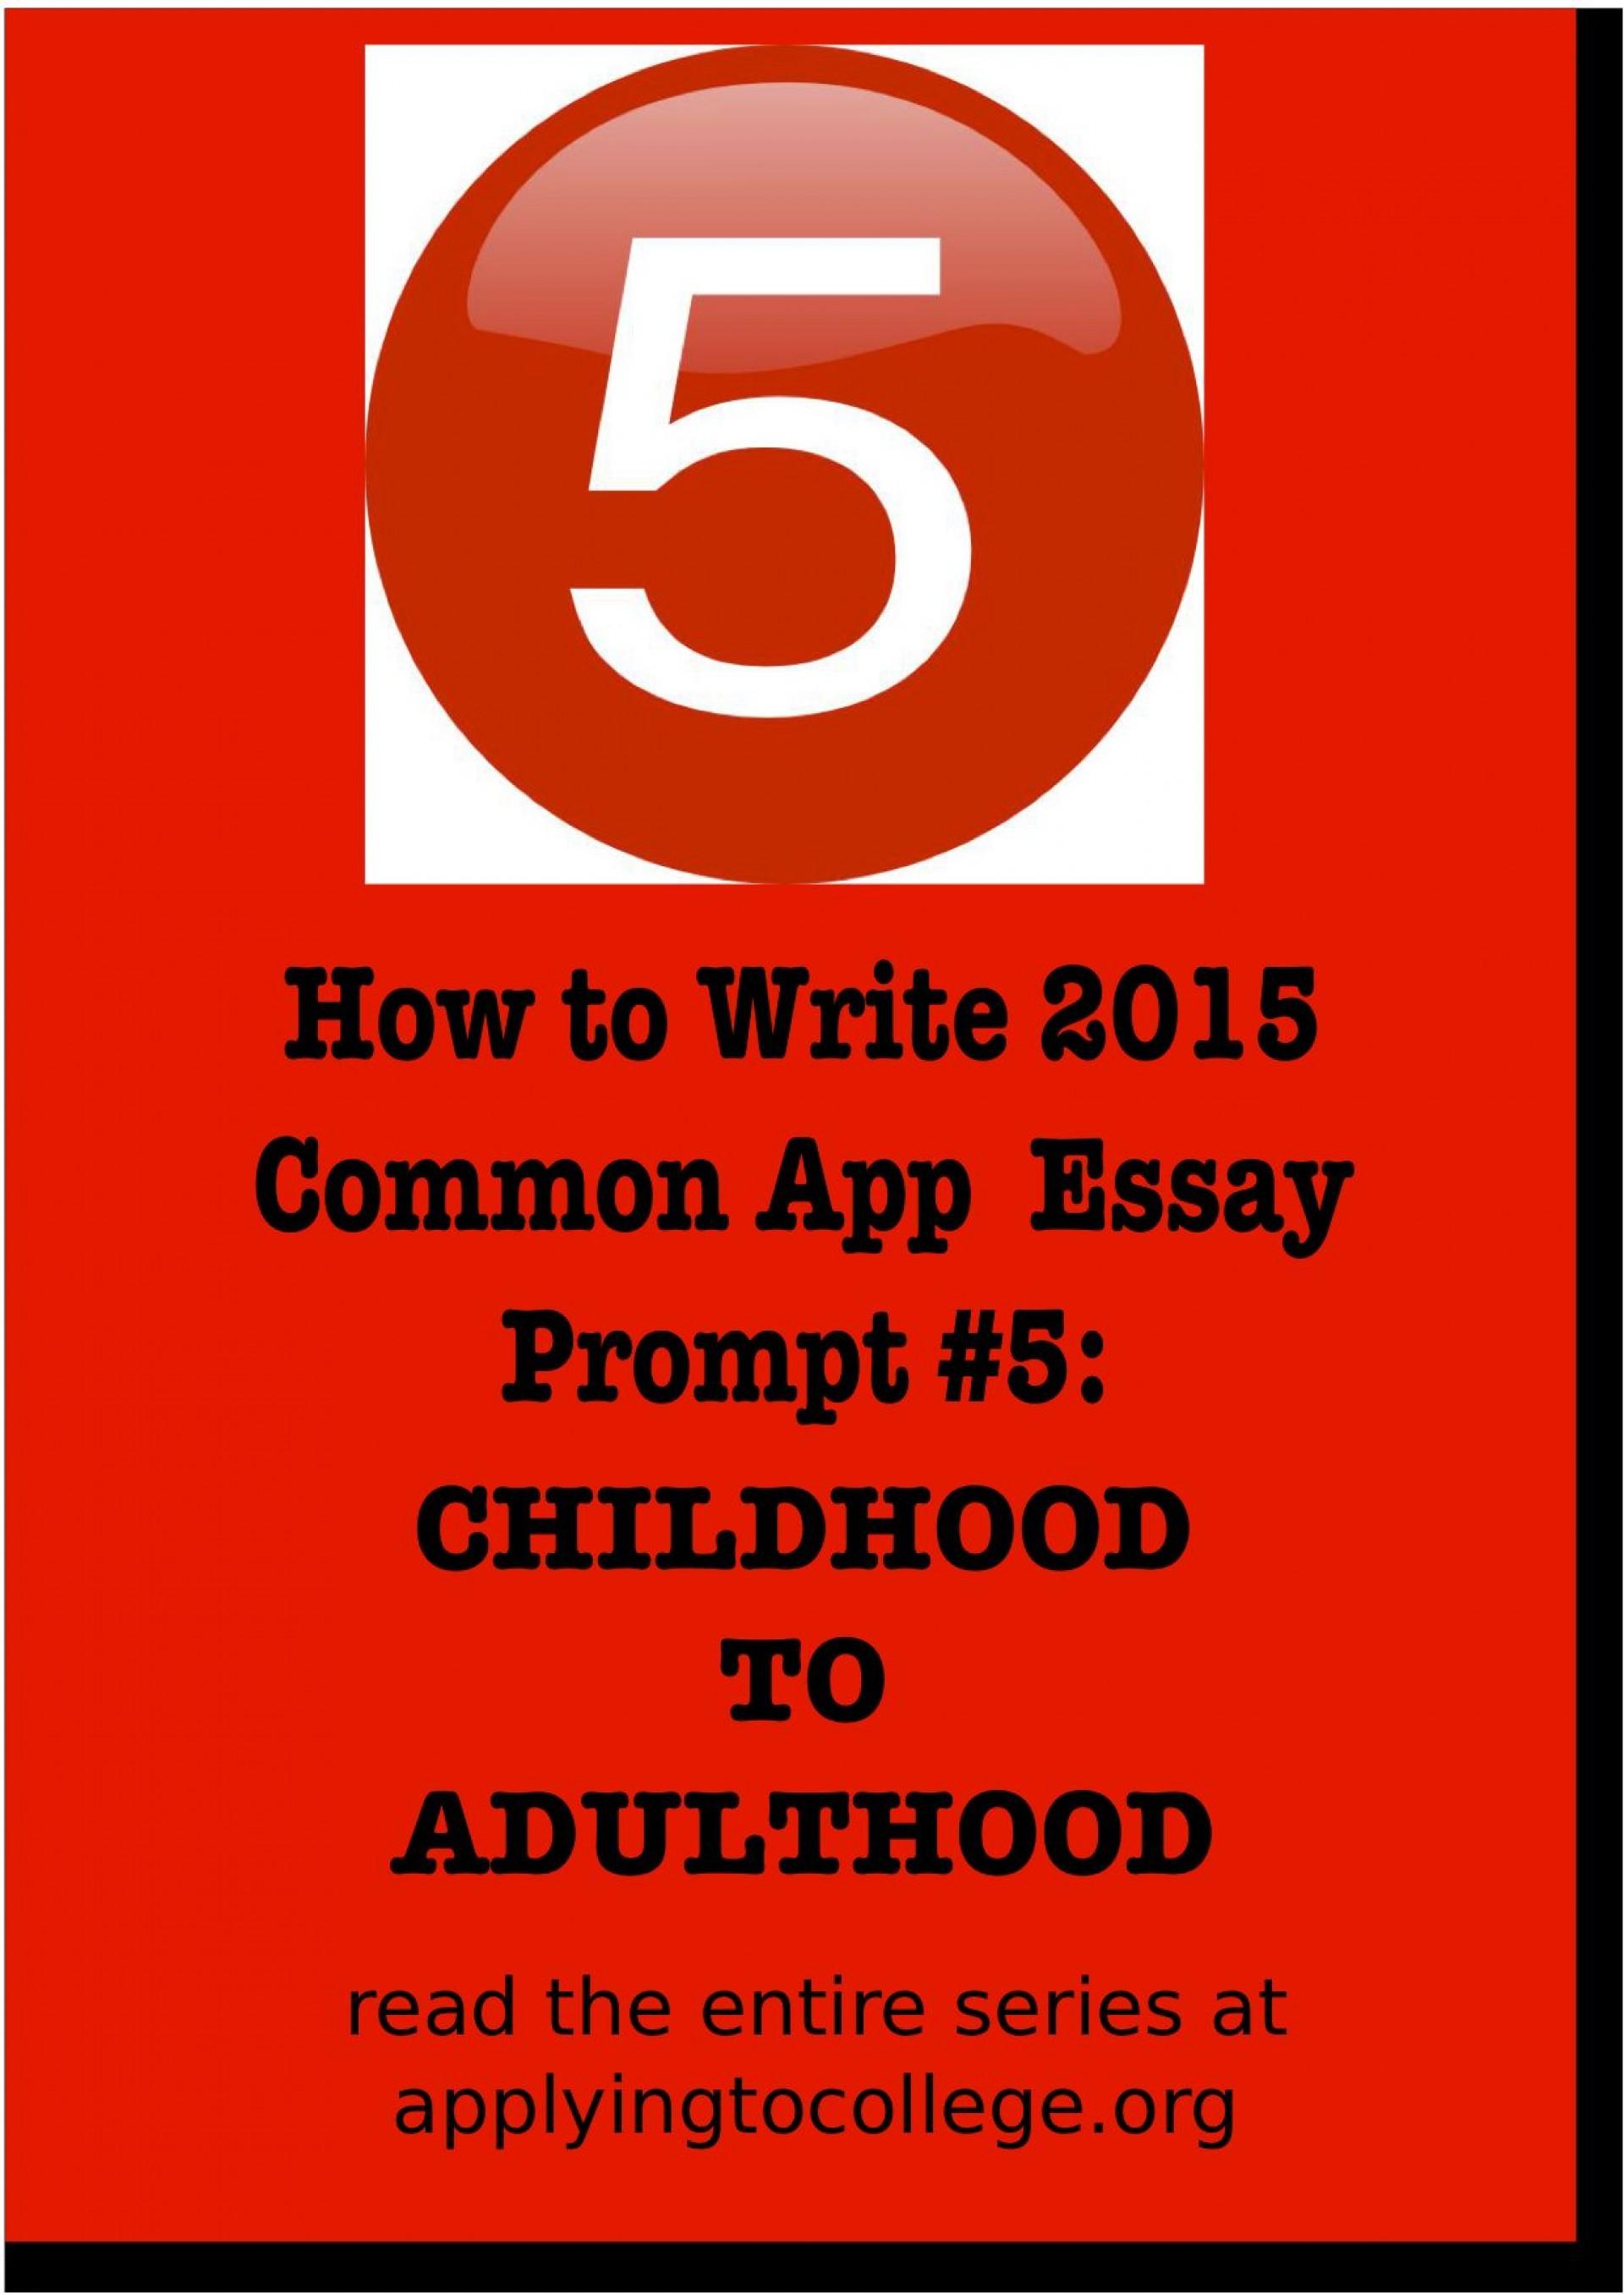 013 Essay Example Common App Unusual Prompt Examples 6 1 Sample 1920